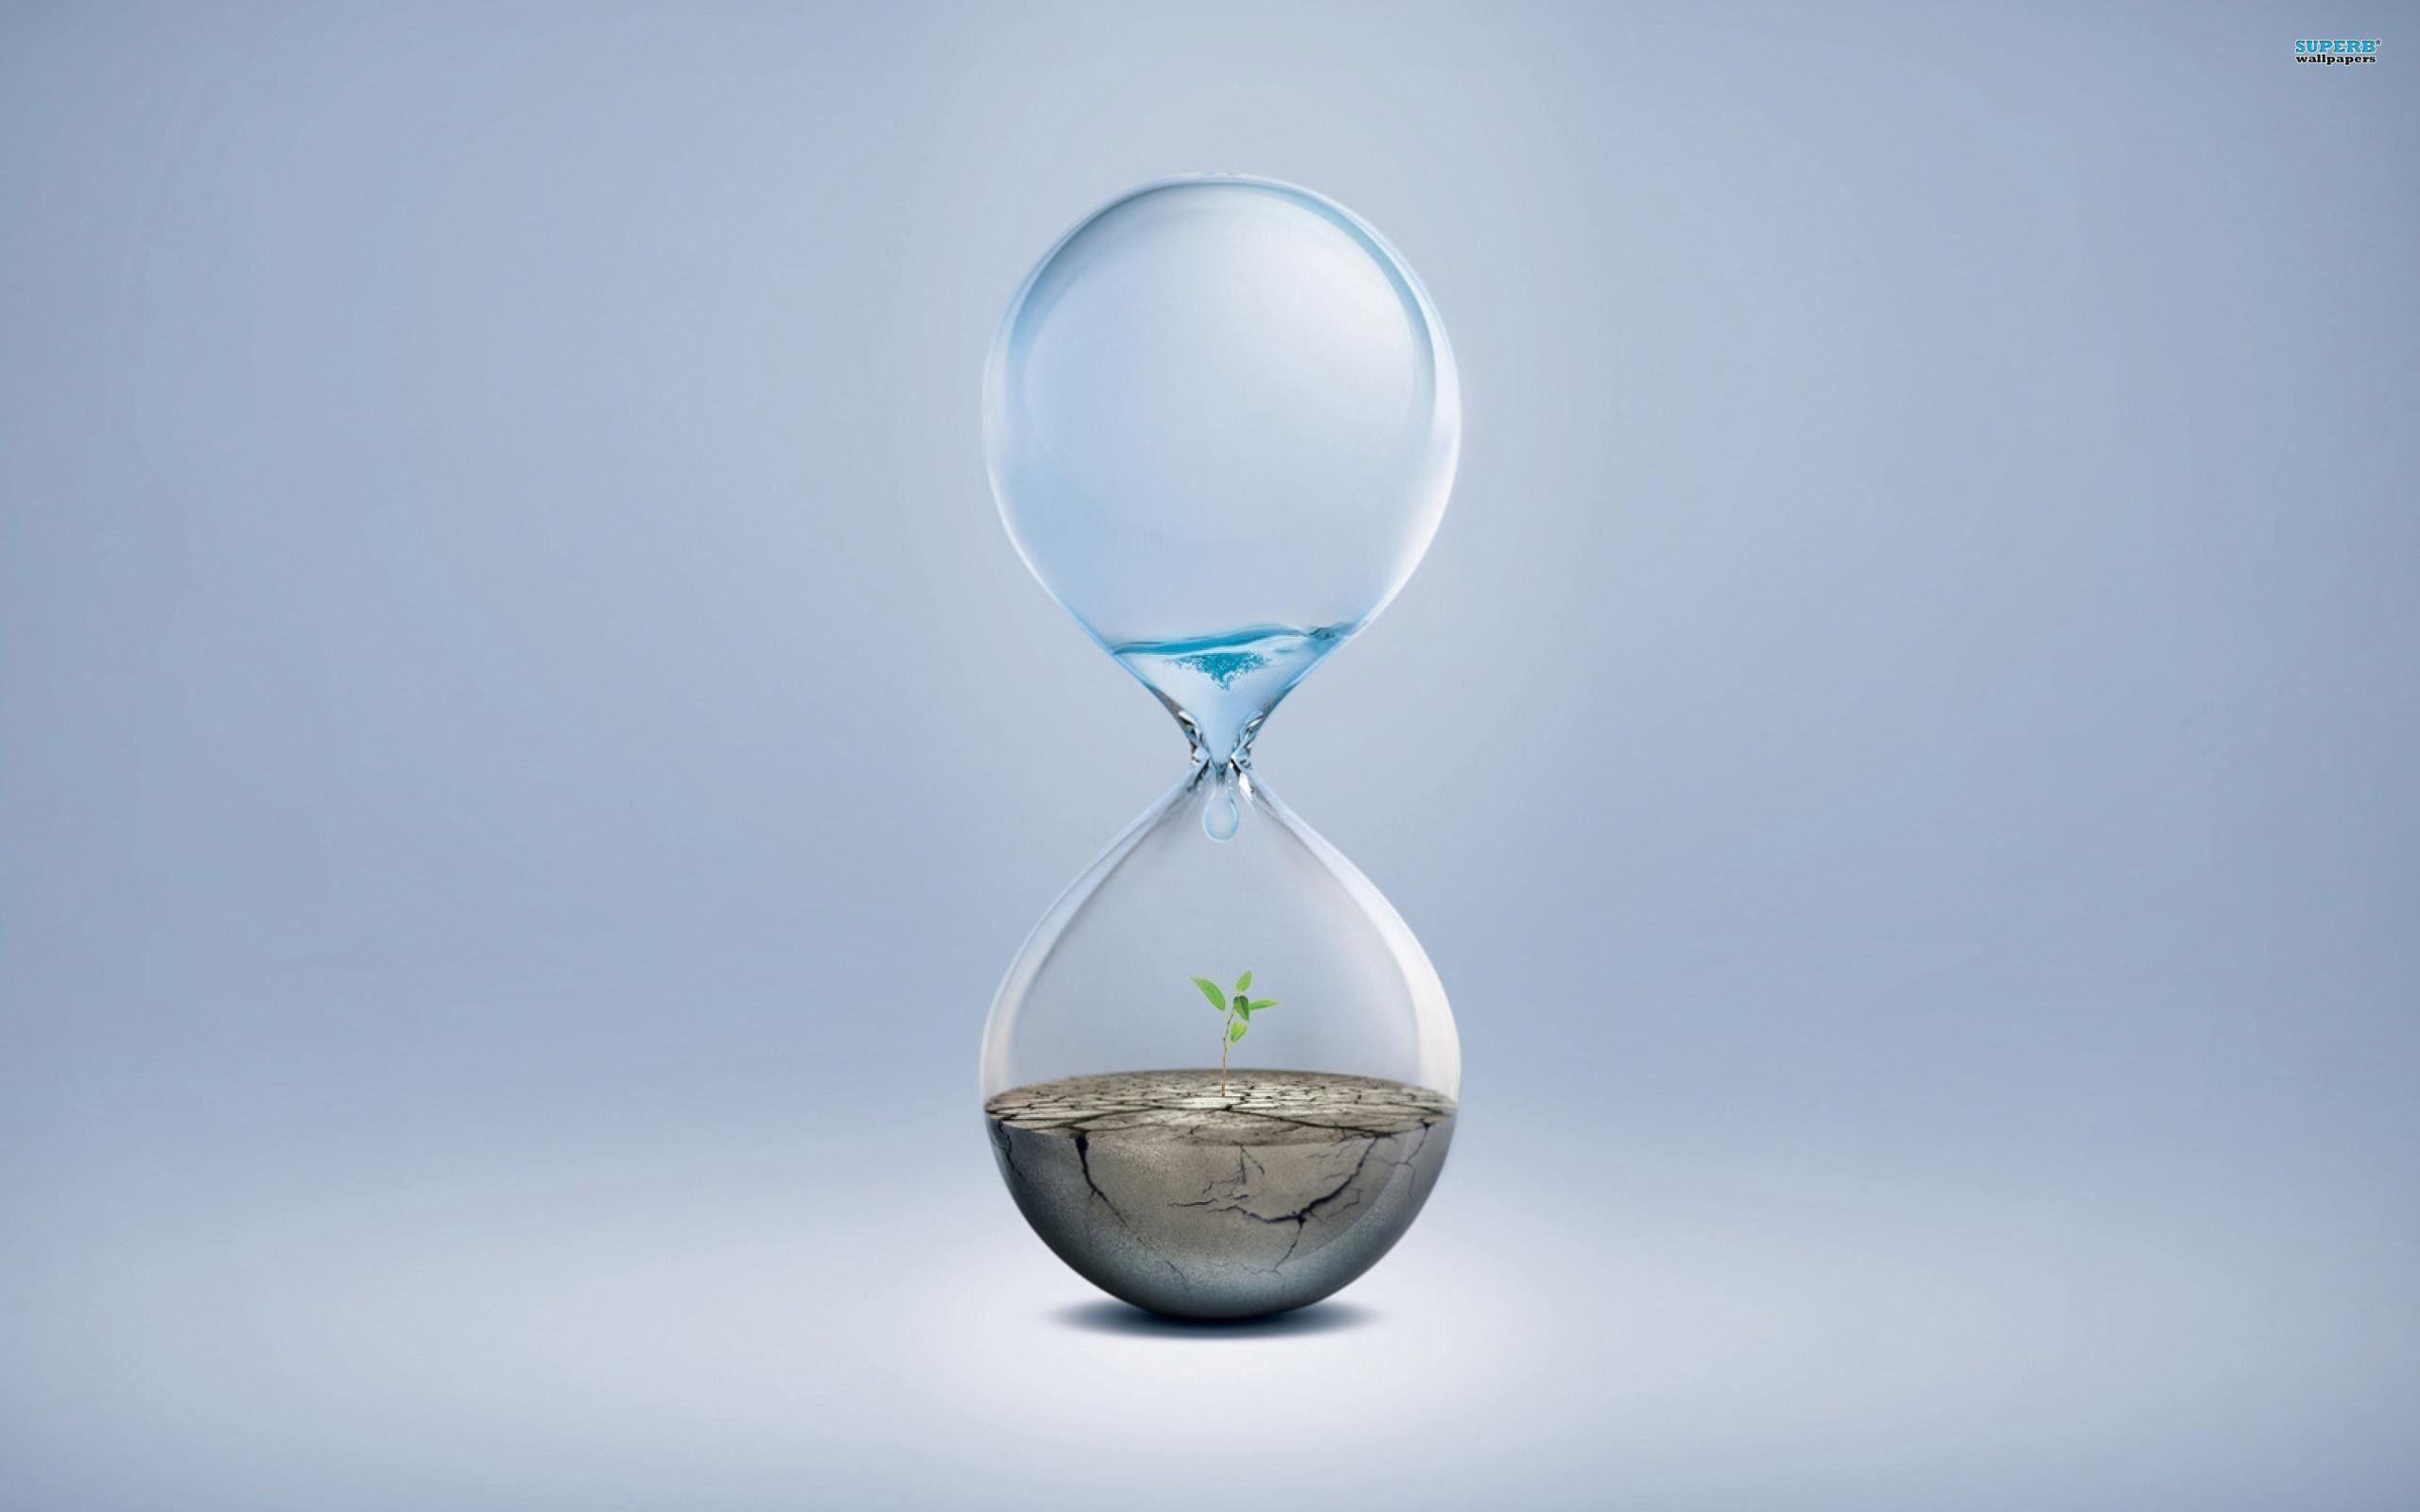 Res: 2560x1600, Hourglass wallpaper - Digital Art wallpapers - #